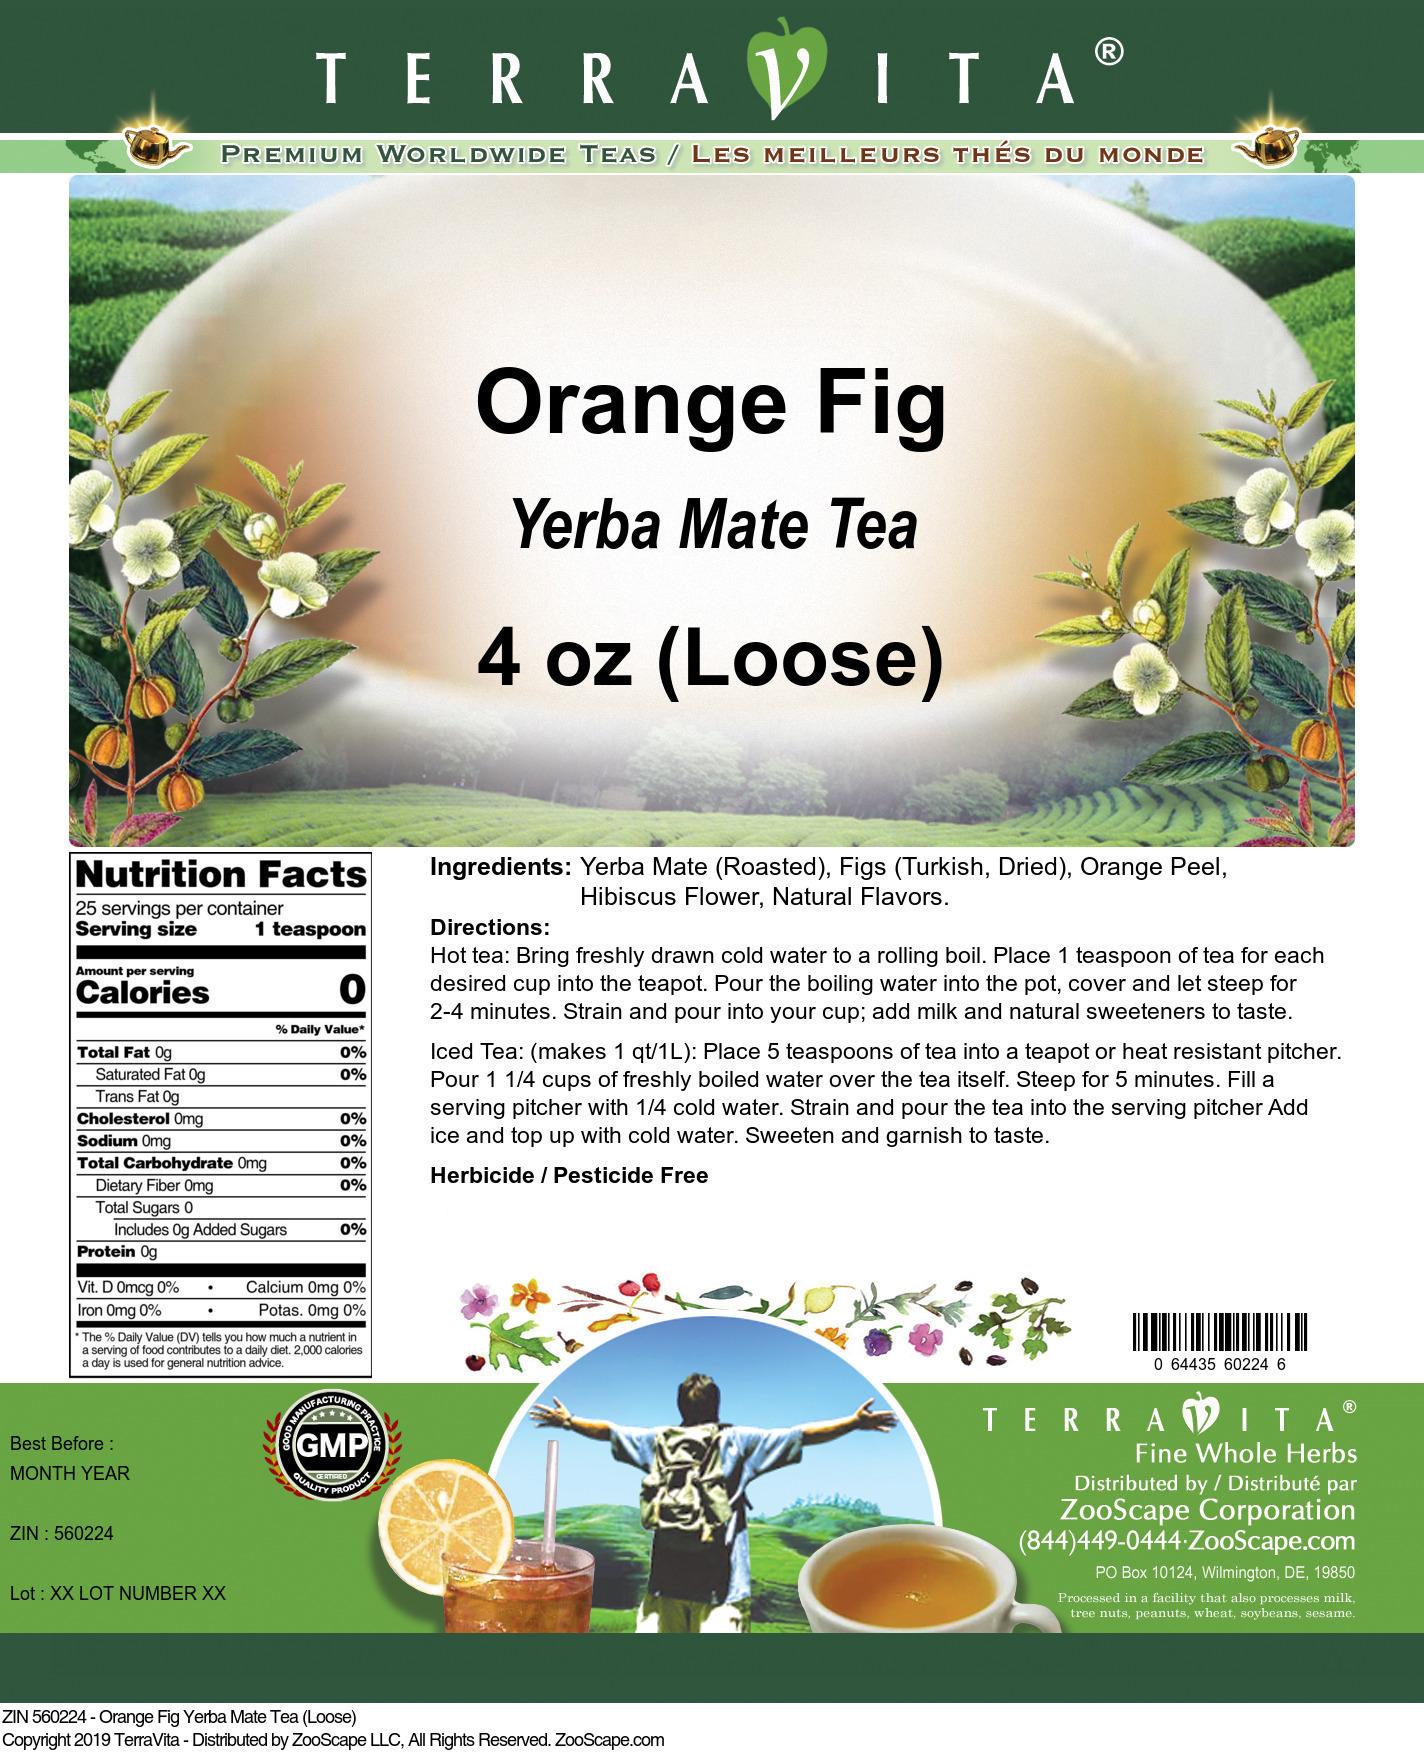 Orange Fig Yerba Mate